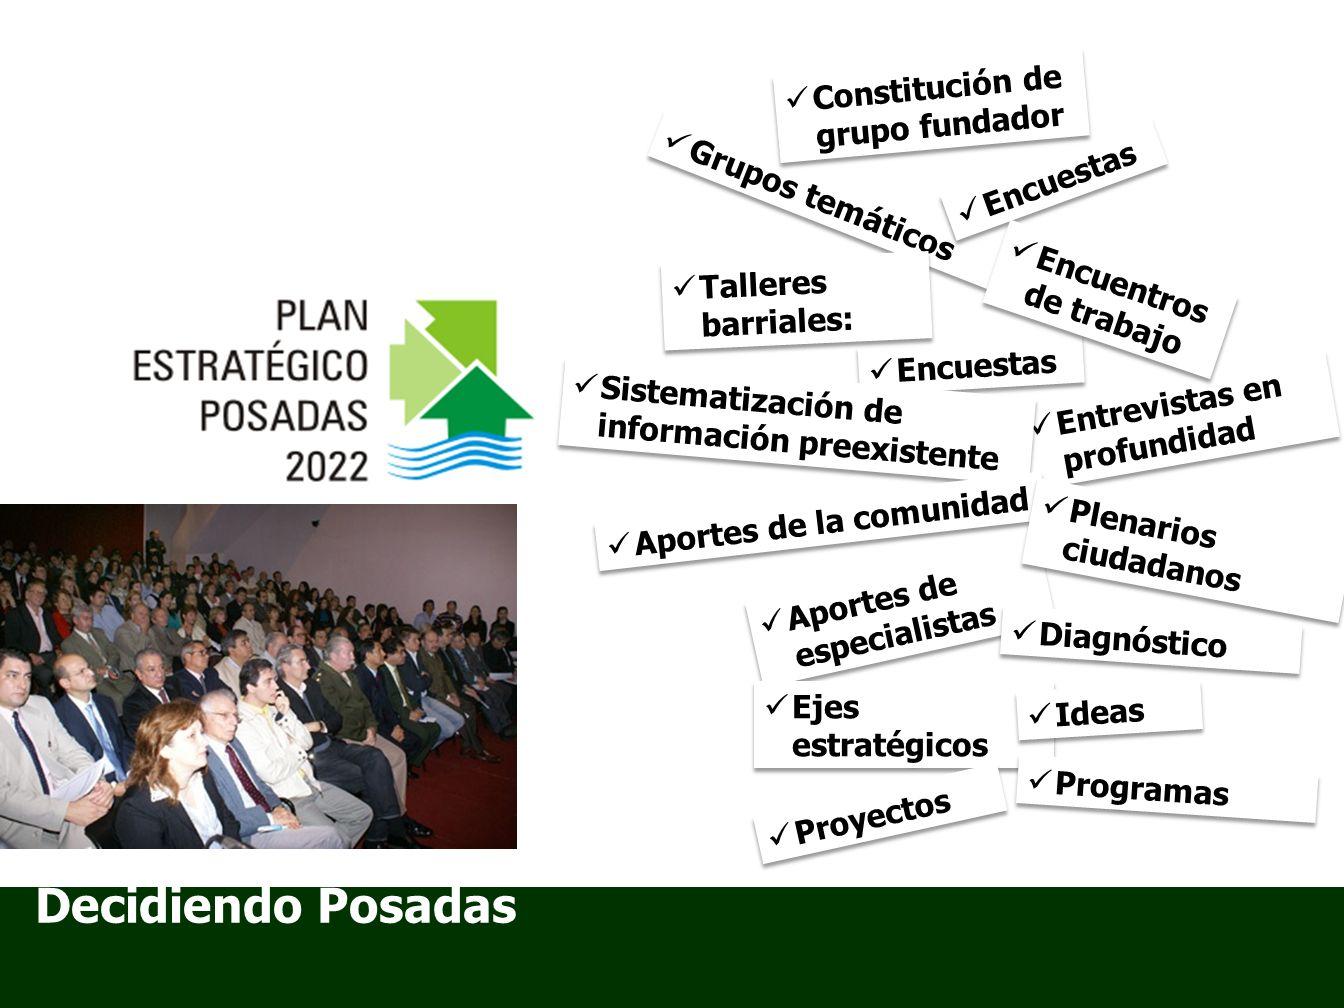 1-Visión / 4-Ejes estratégico /15-Programas / 55- Proyectos POR DONDE EMPEZAR..?